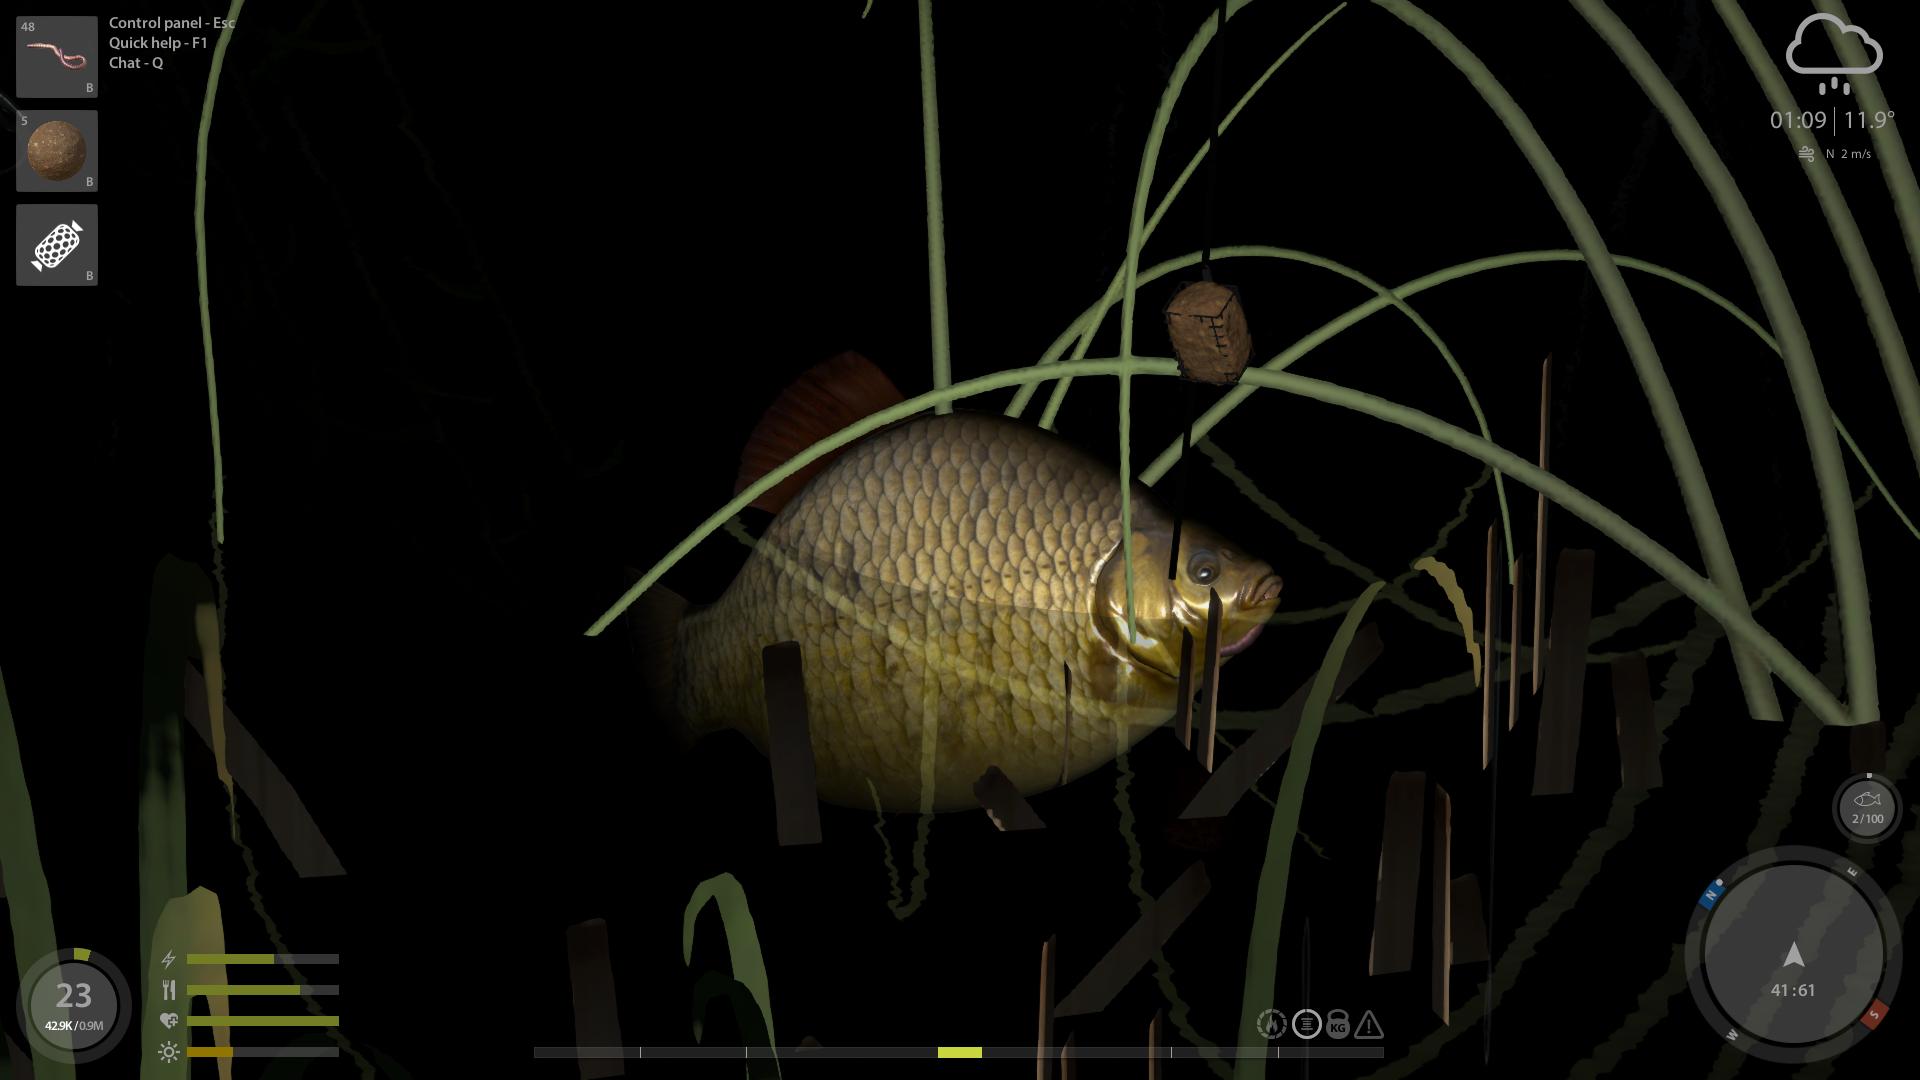 Russian Fishing 4 *Gratis* CrucianT.png.551047f48e61e4db3641e7052e9b6cc5